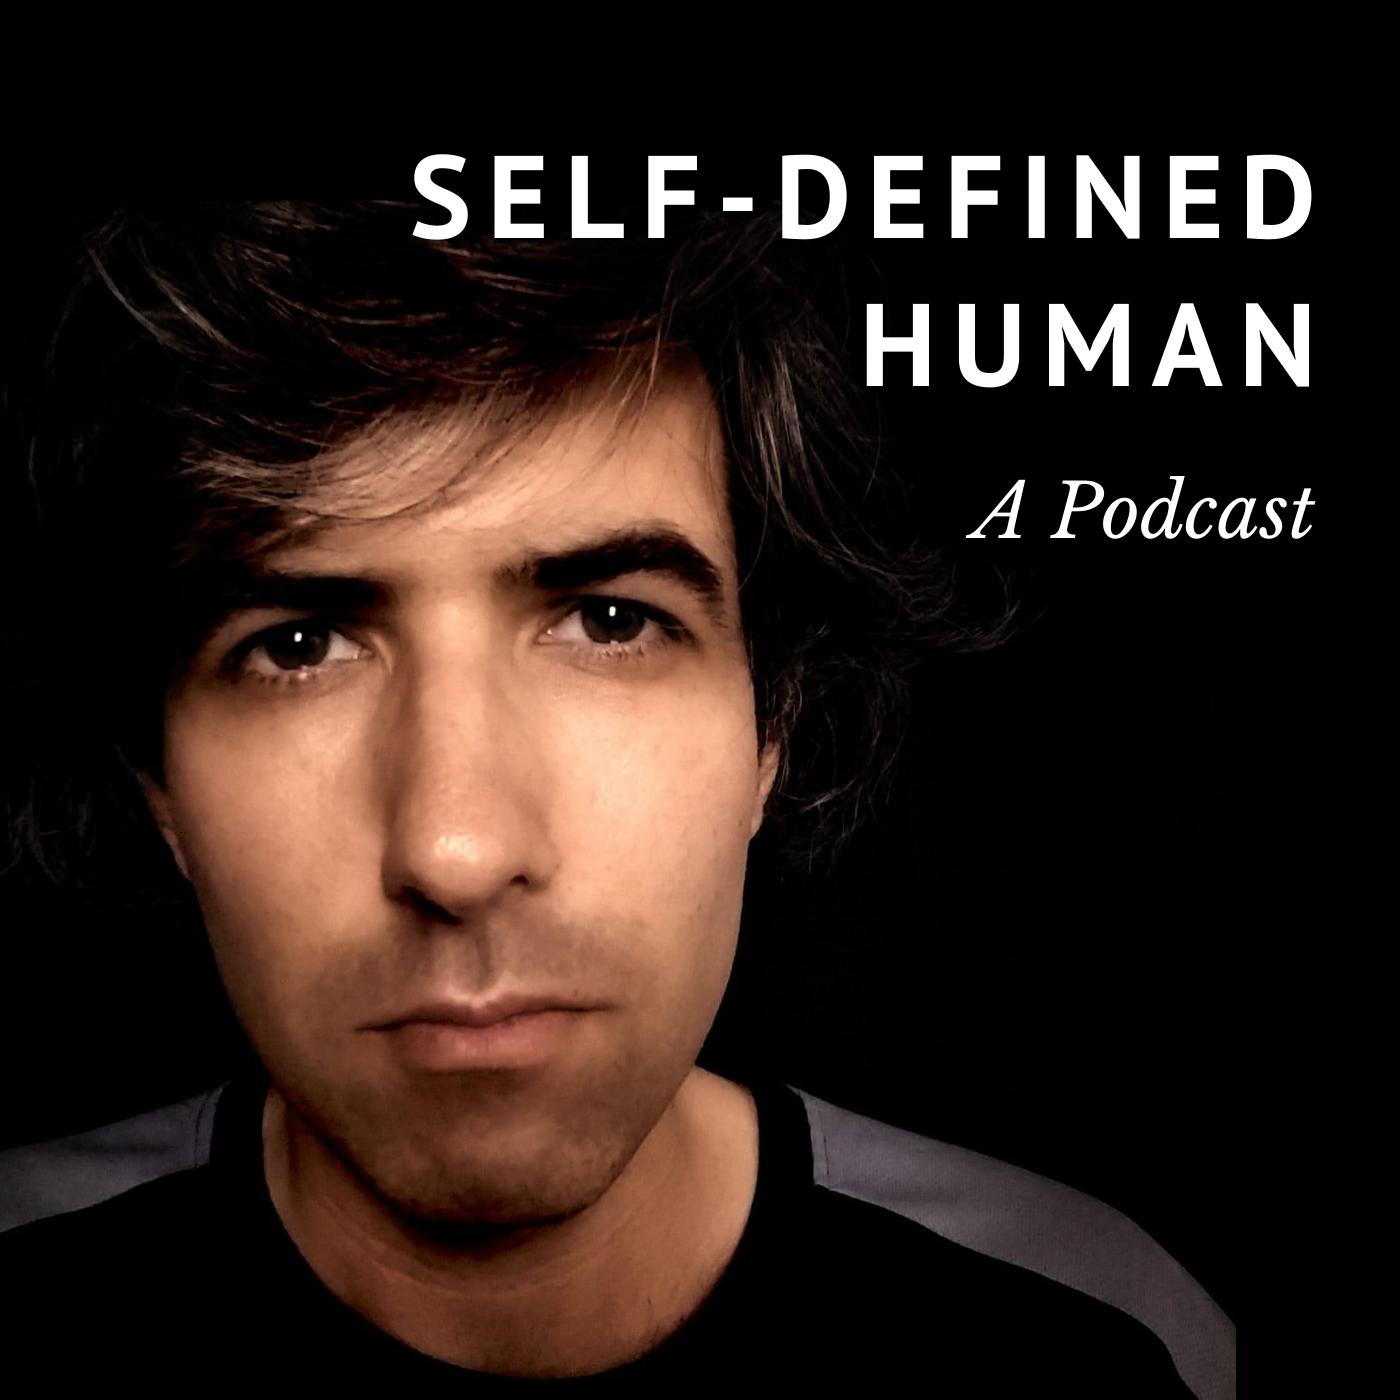 Self-Defined Human